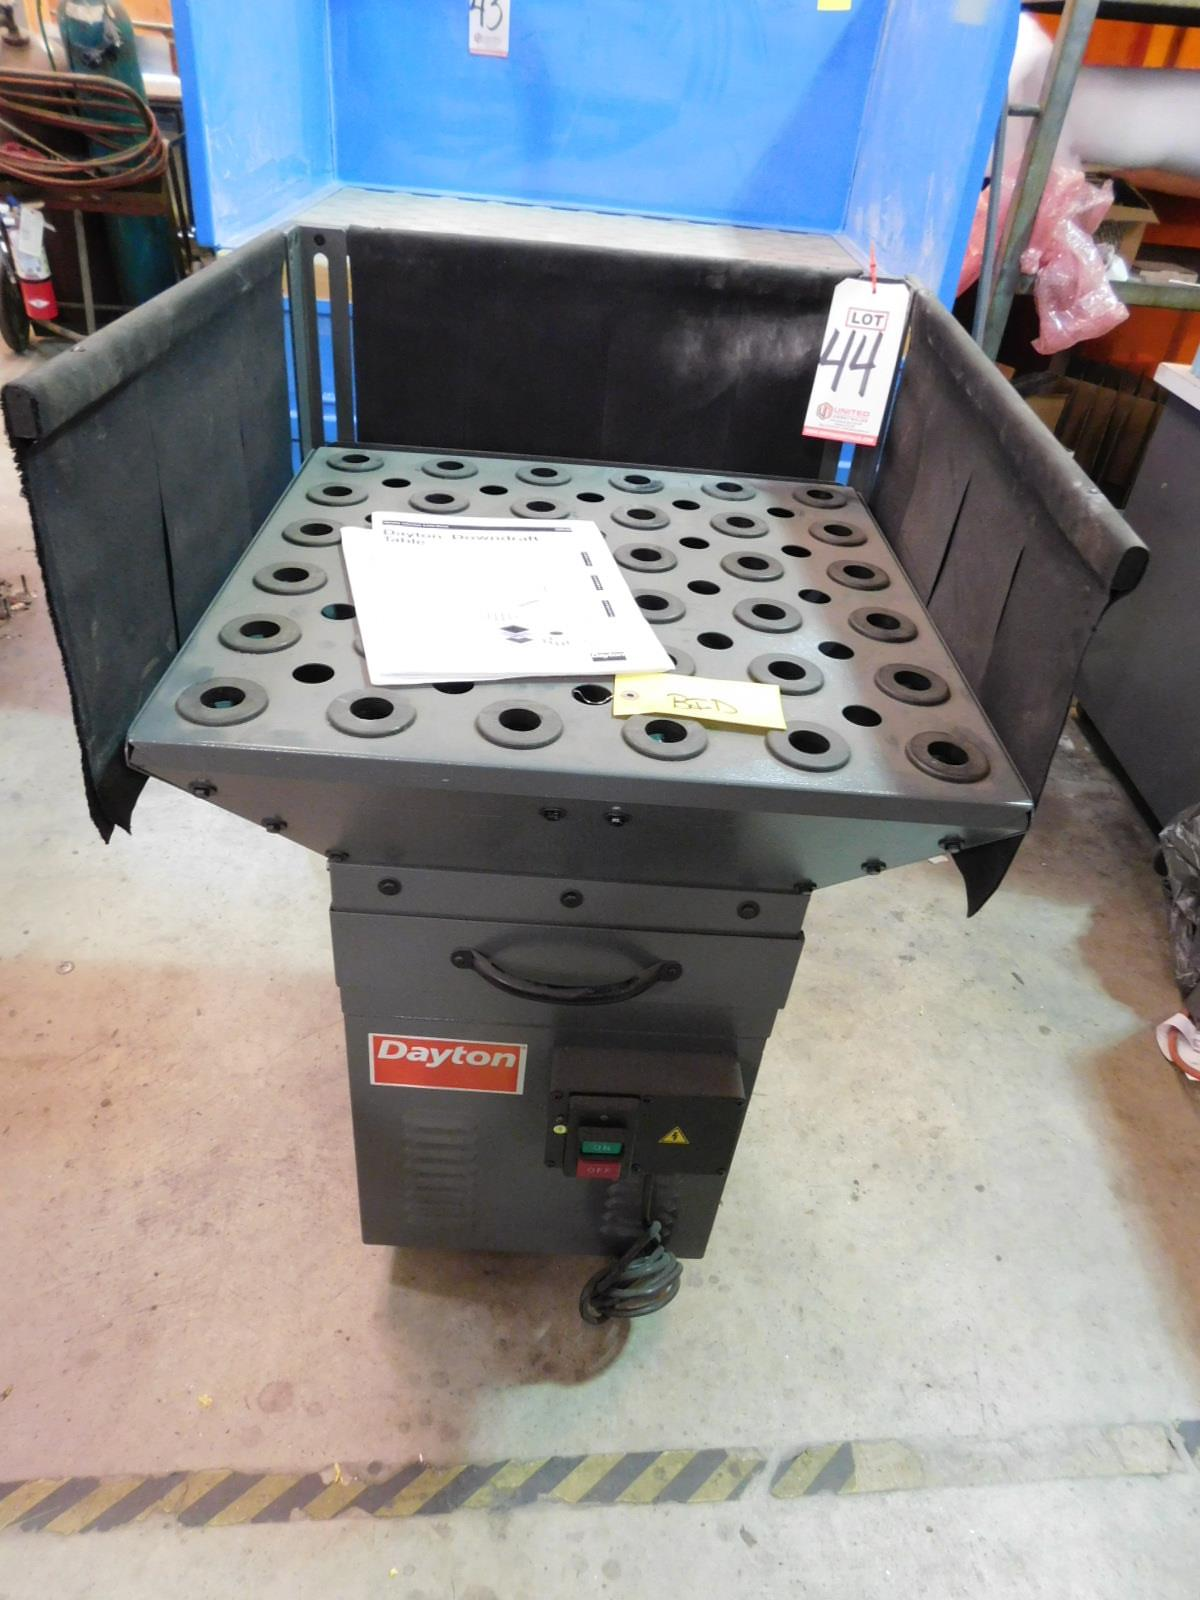 "Lot 44 - DAYTON DOWNDRAFT TABLE, MODEL 22DL62, 400 CFM, FILTER RATING: 5 MICRON, WORKTOP MEASURES 24"" X 24"""